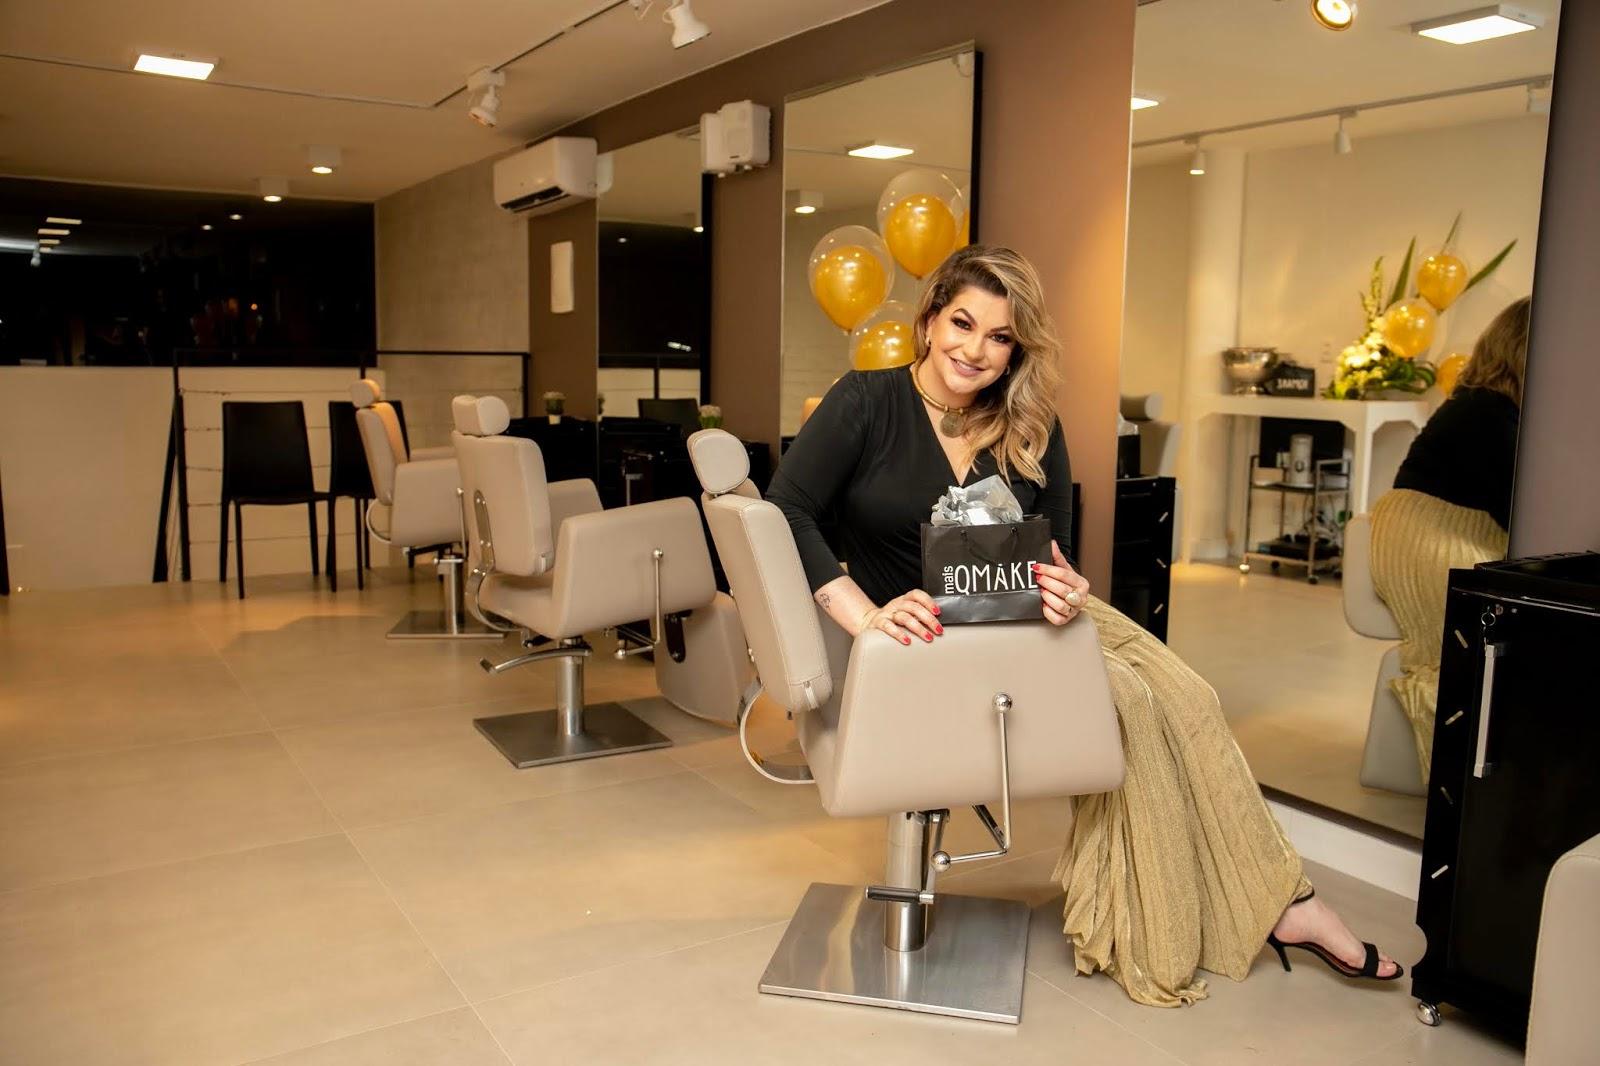 Novo espaço de beleza MAISQMAKE recebe a Top Beauty Influencer Alice Salazar